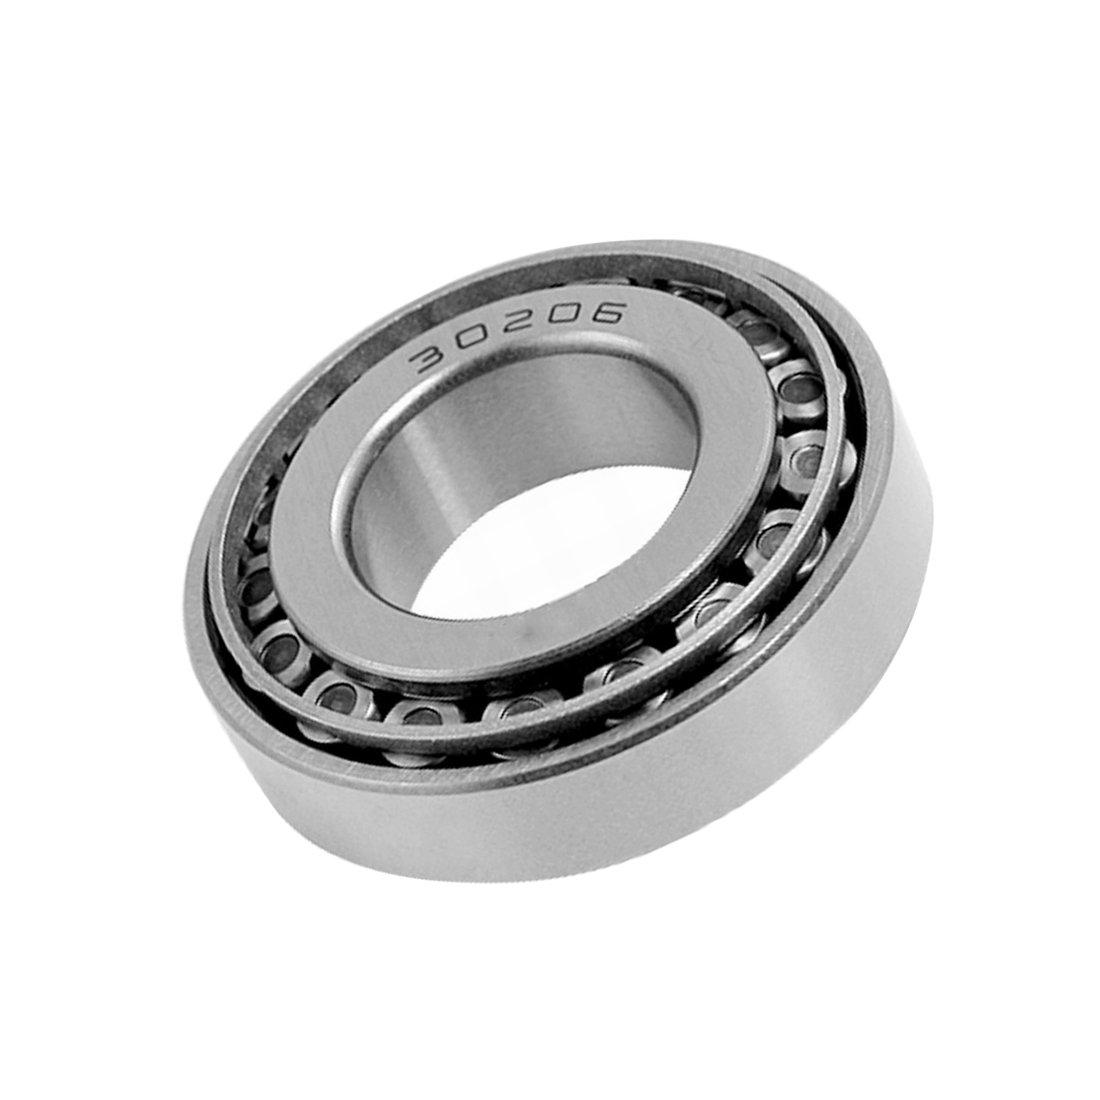 ZXHAO 30206 Standard Tolerance Tapered Roller Bearings 62x30x17mm (2-7/16